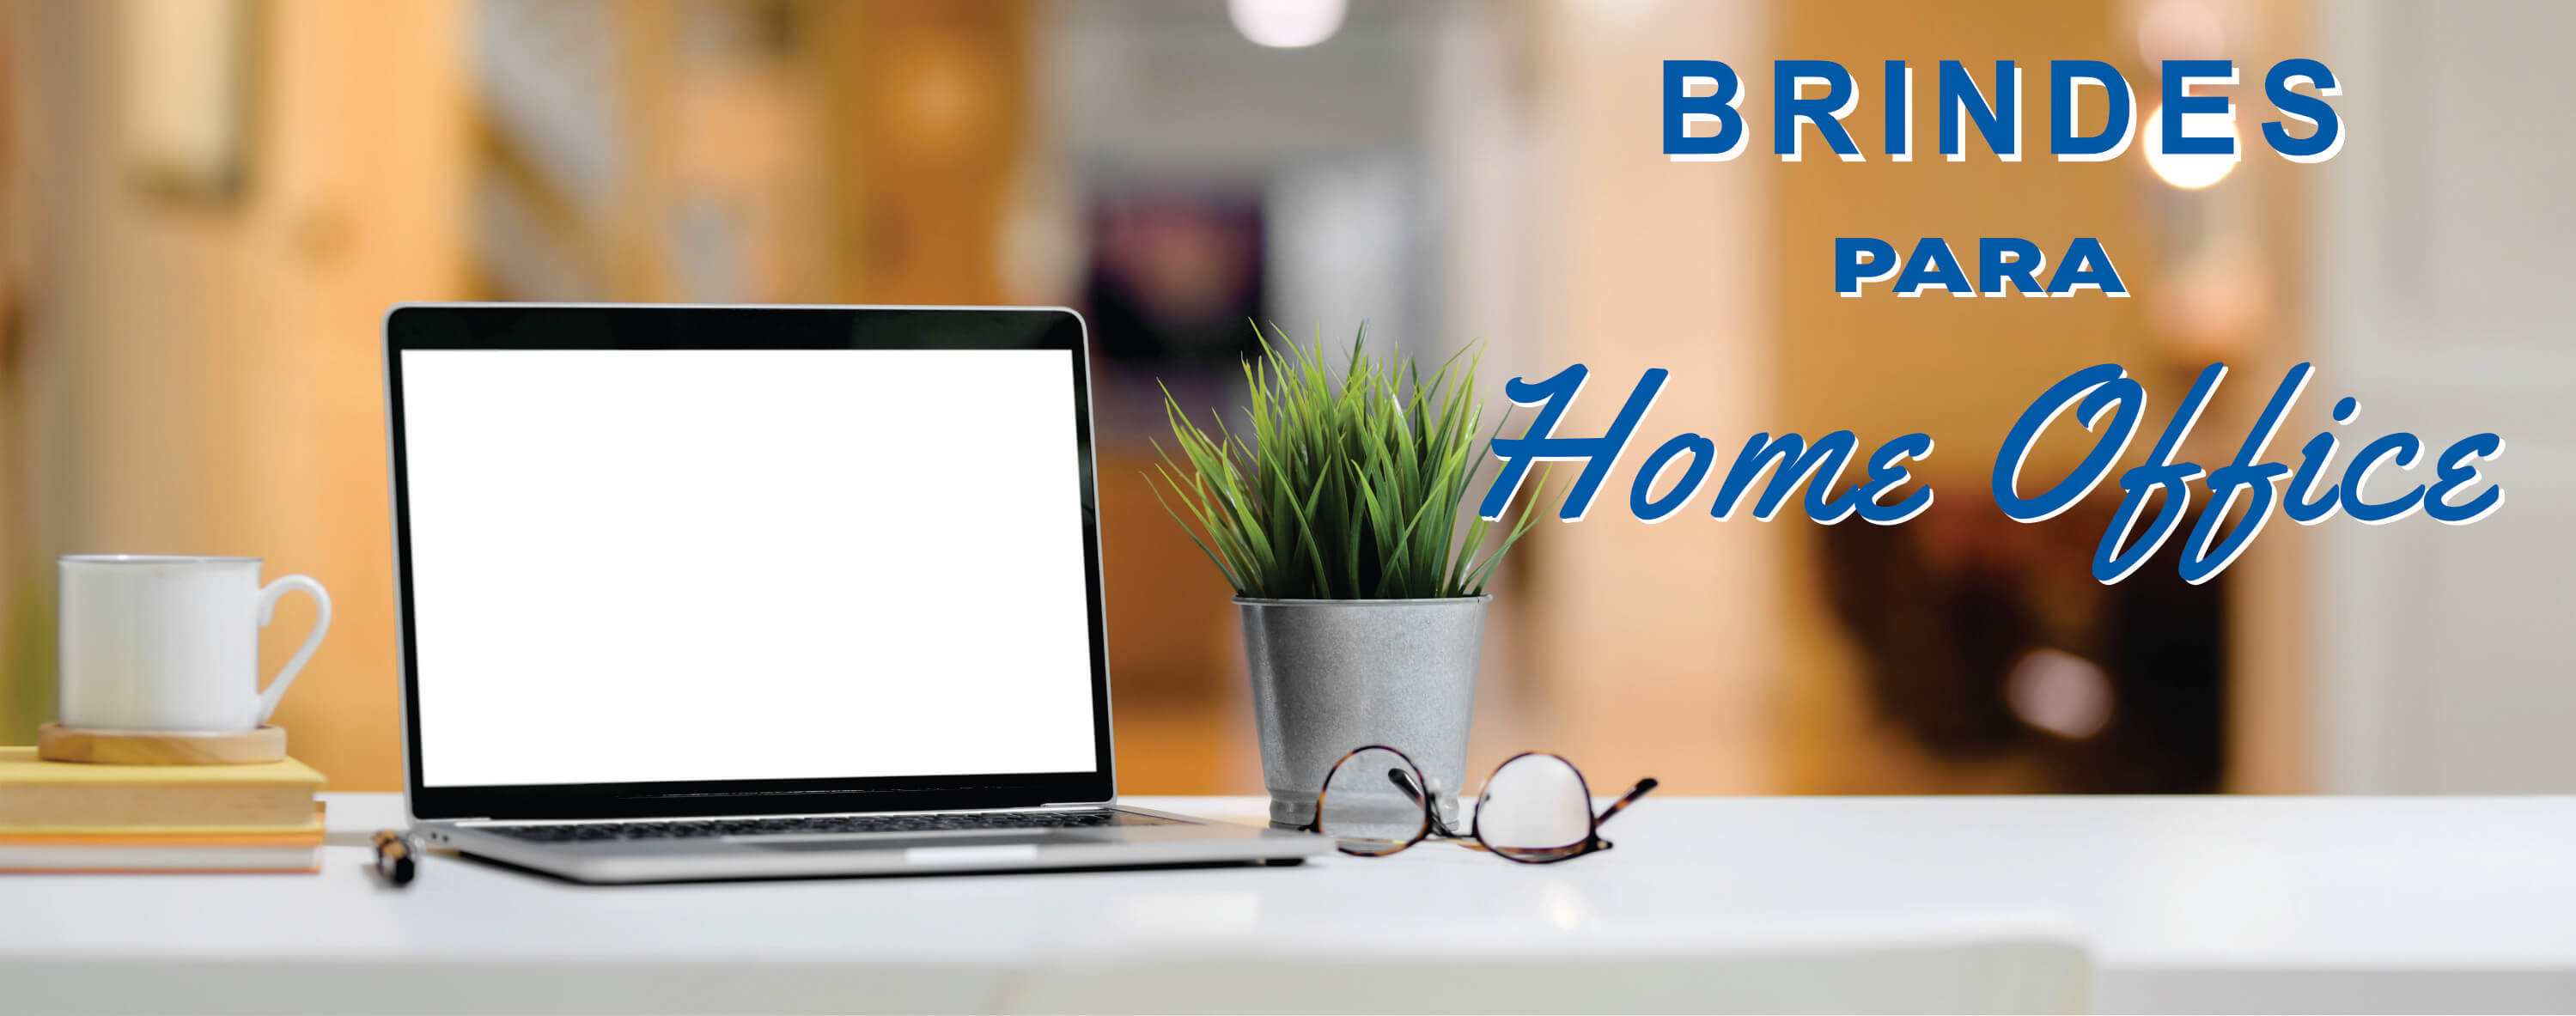 brindes-para-home-office-sao-paulo